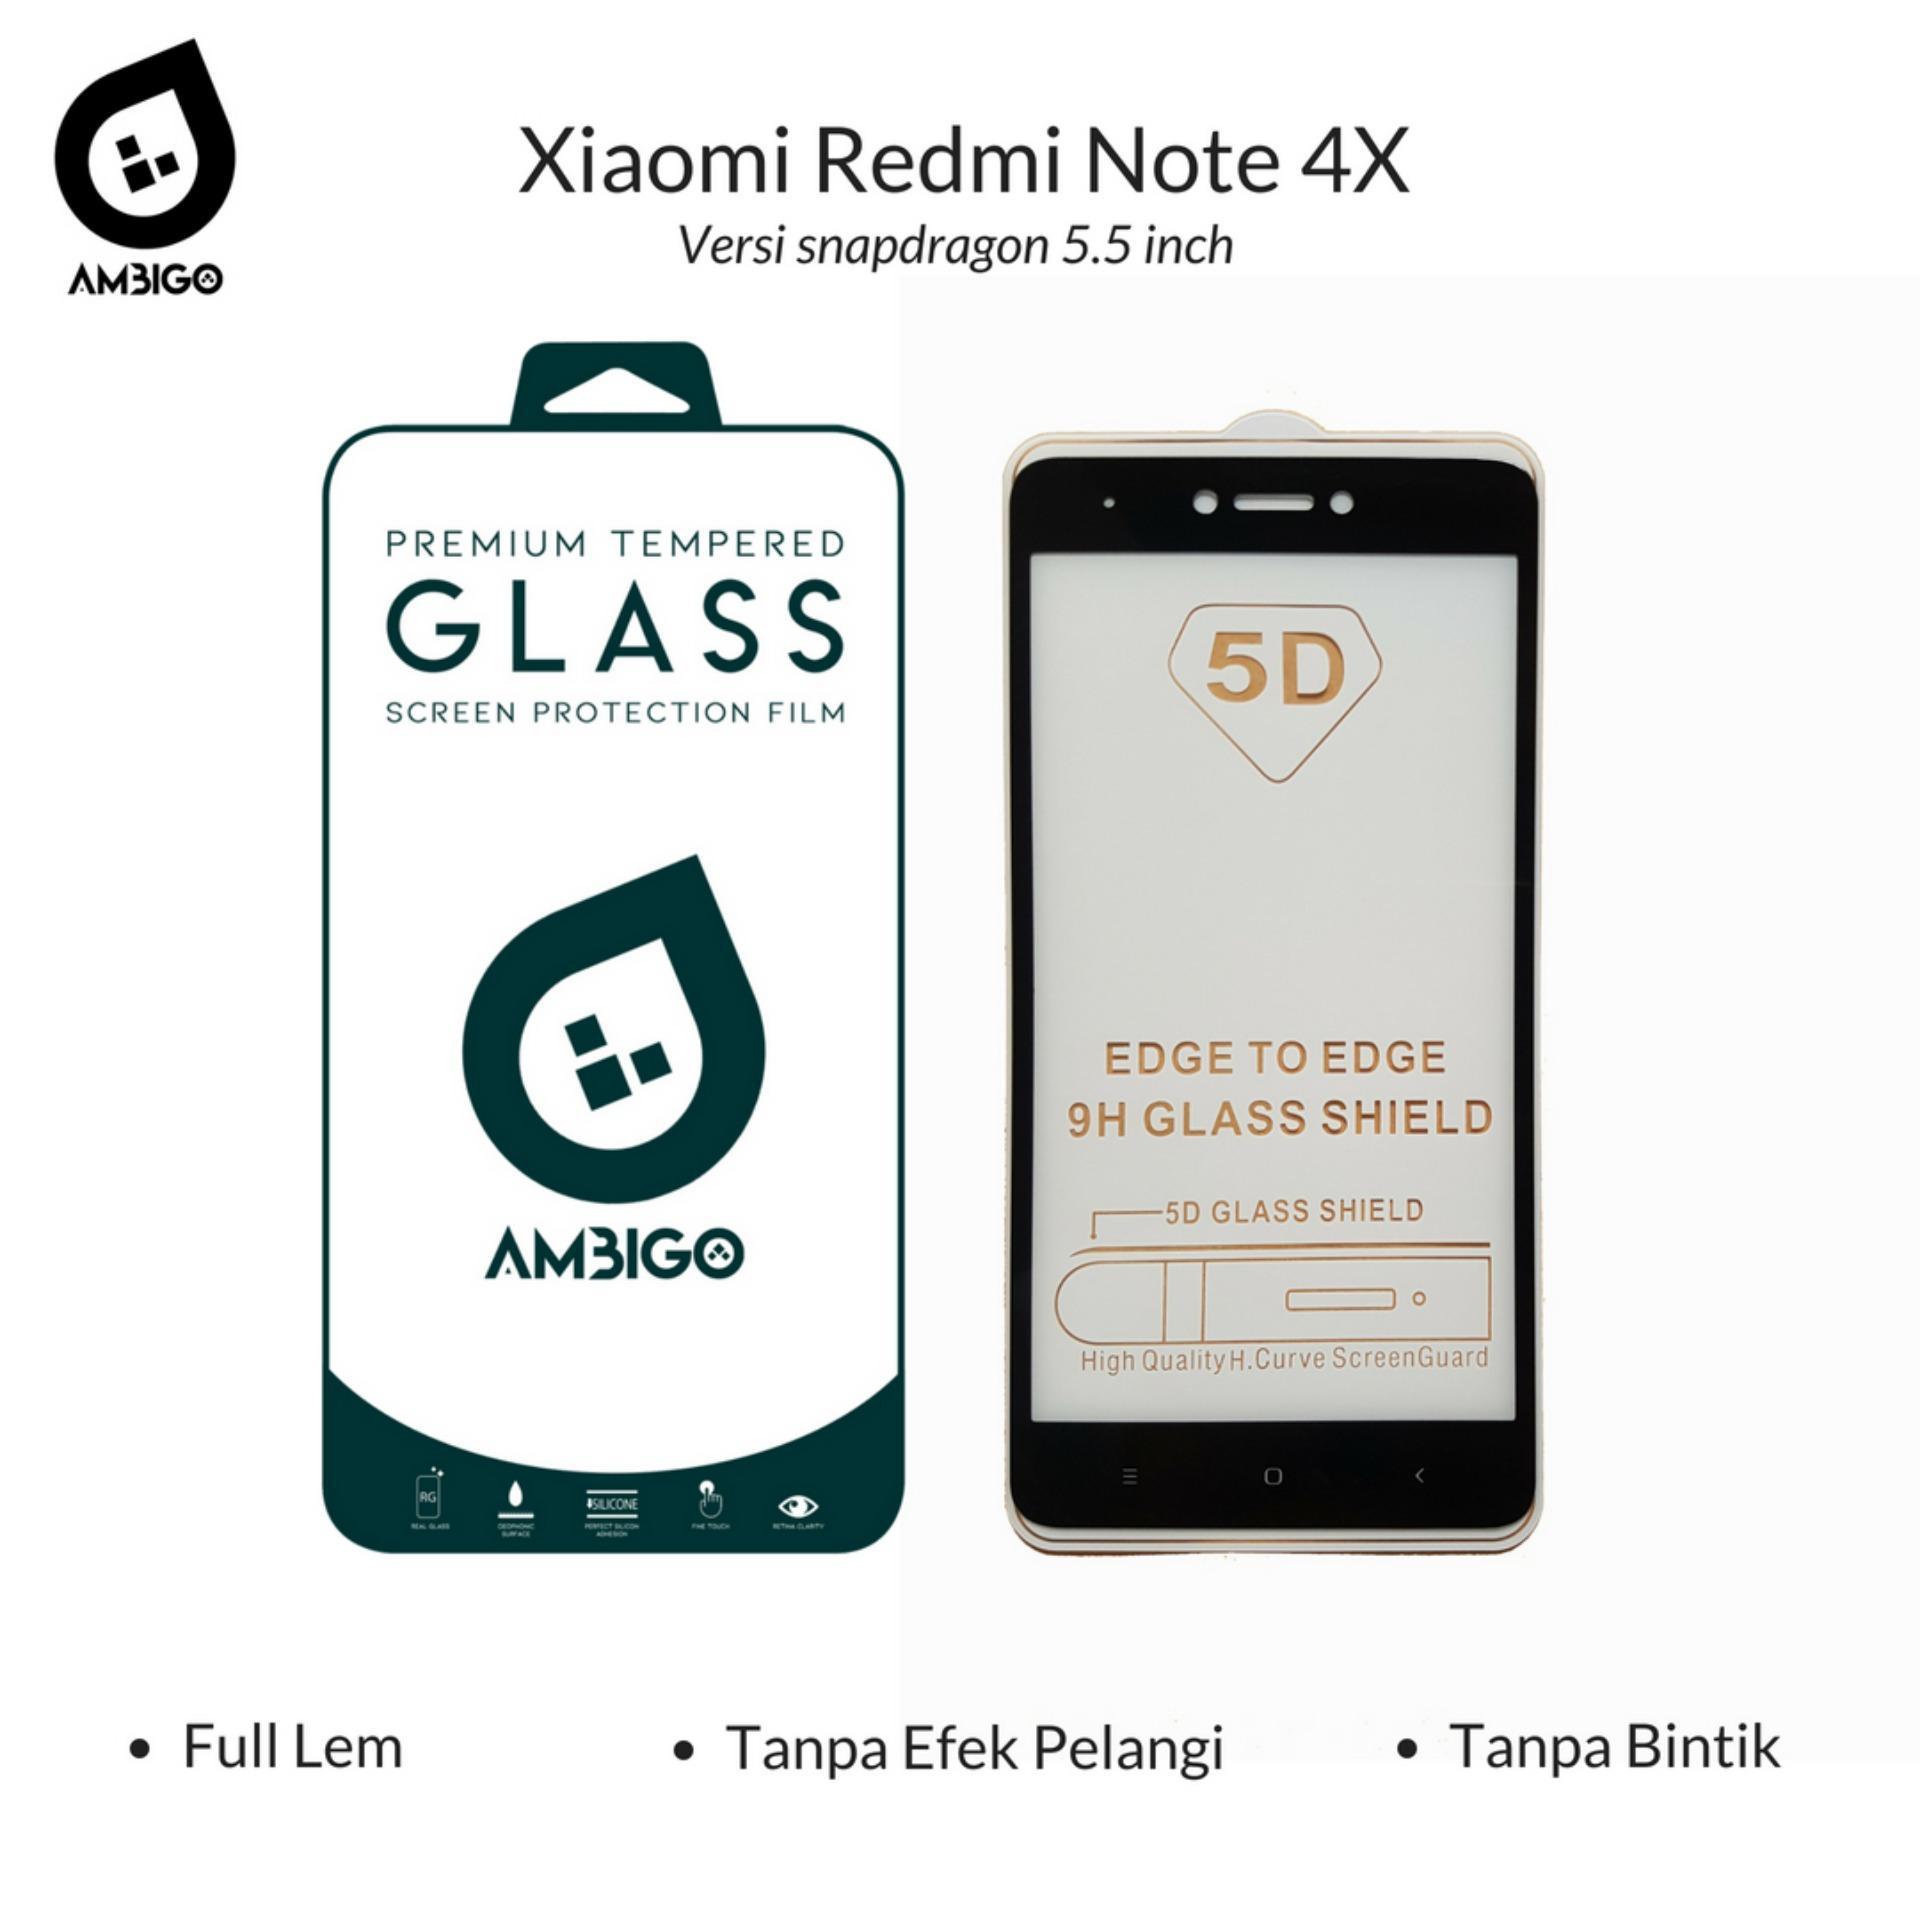 Accessories Hp Ambigo Tempered Glass 5D Full Cover Warna / Anti Gores Kaca Full Lem Untuk Xiaomi Redmi Note 4X / Note 4 Versi Snapdragon 5.5 inch - Black